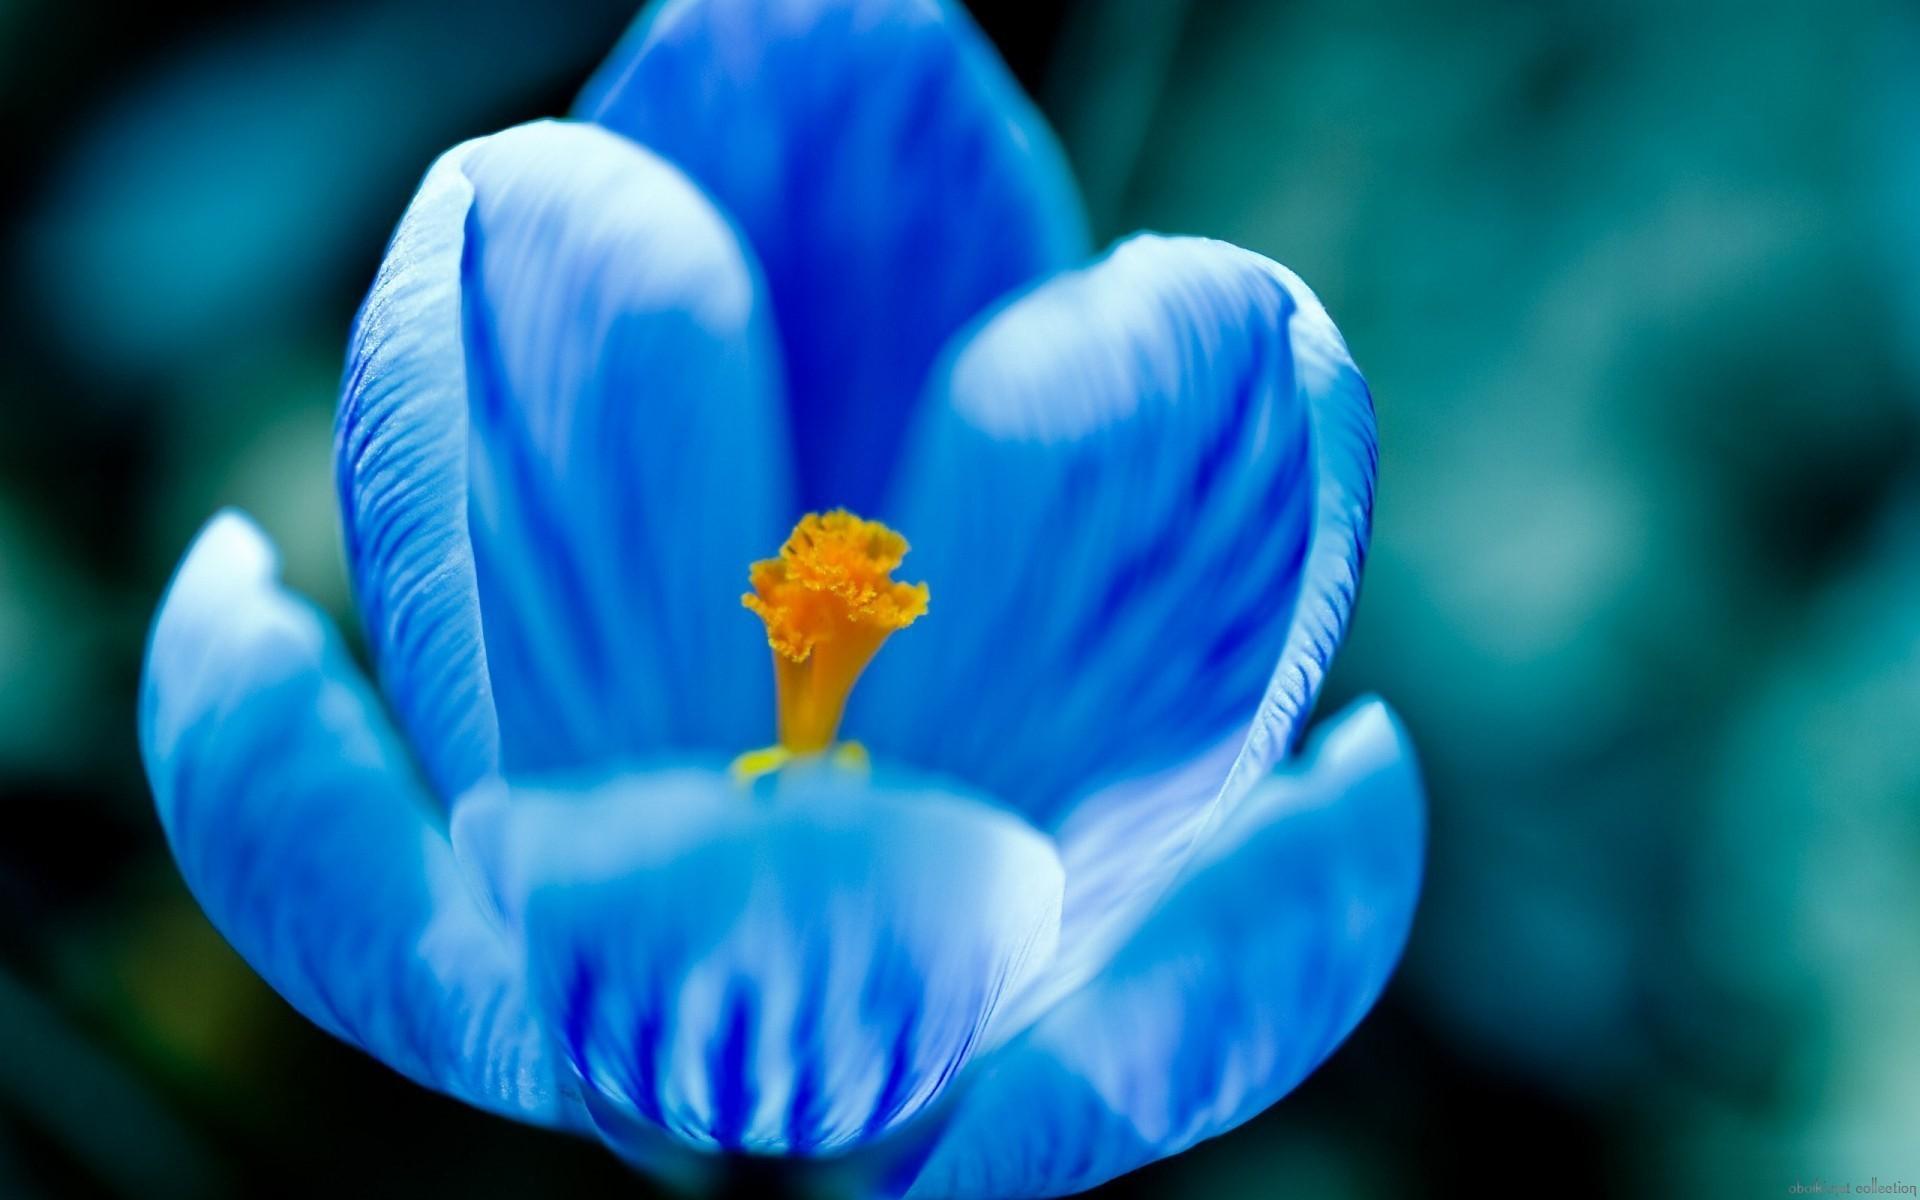 Blue Flowers Wallpaper Download